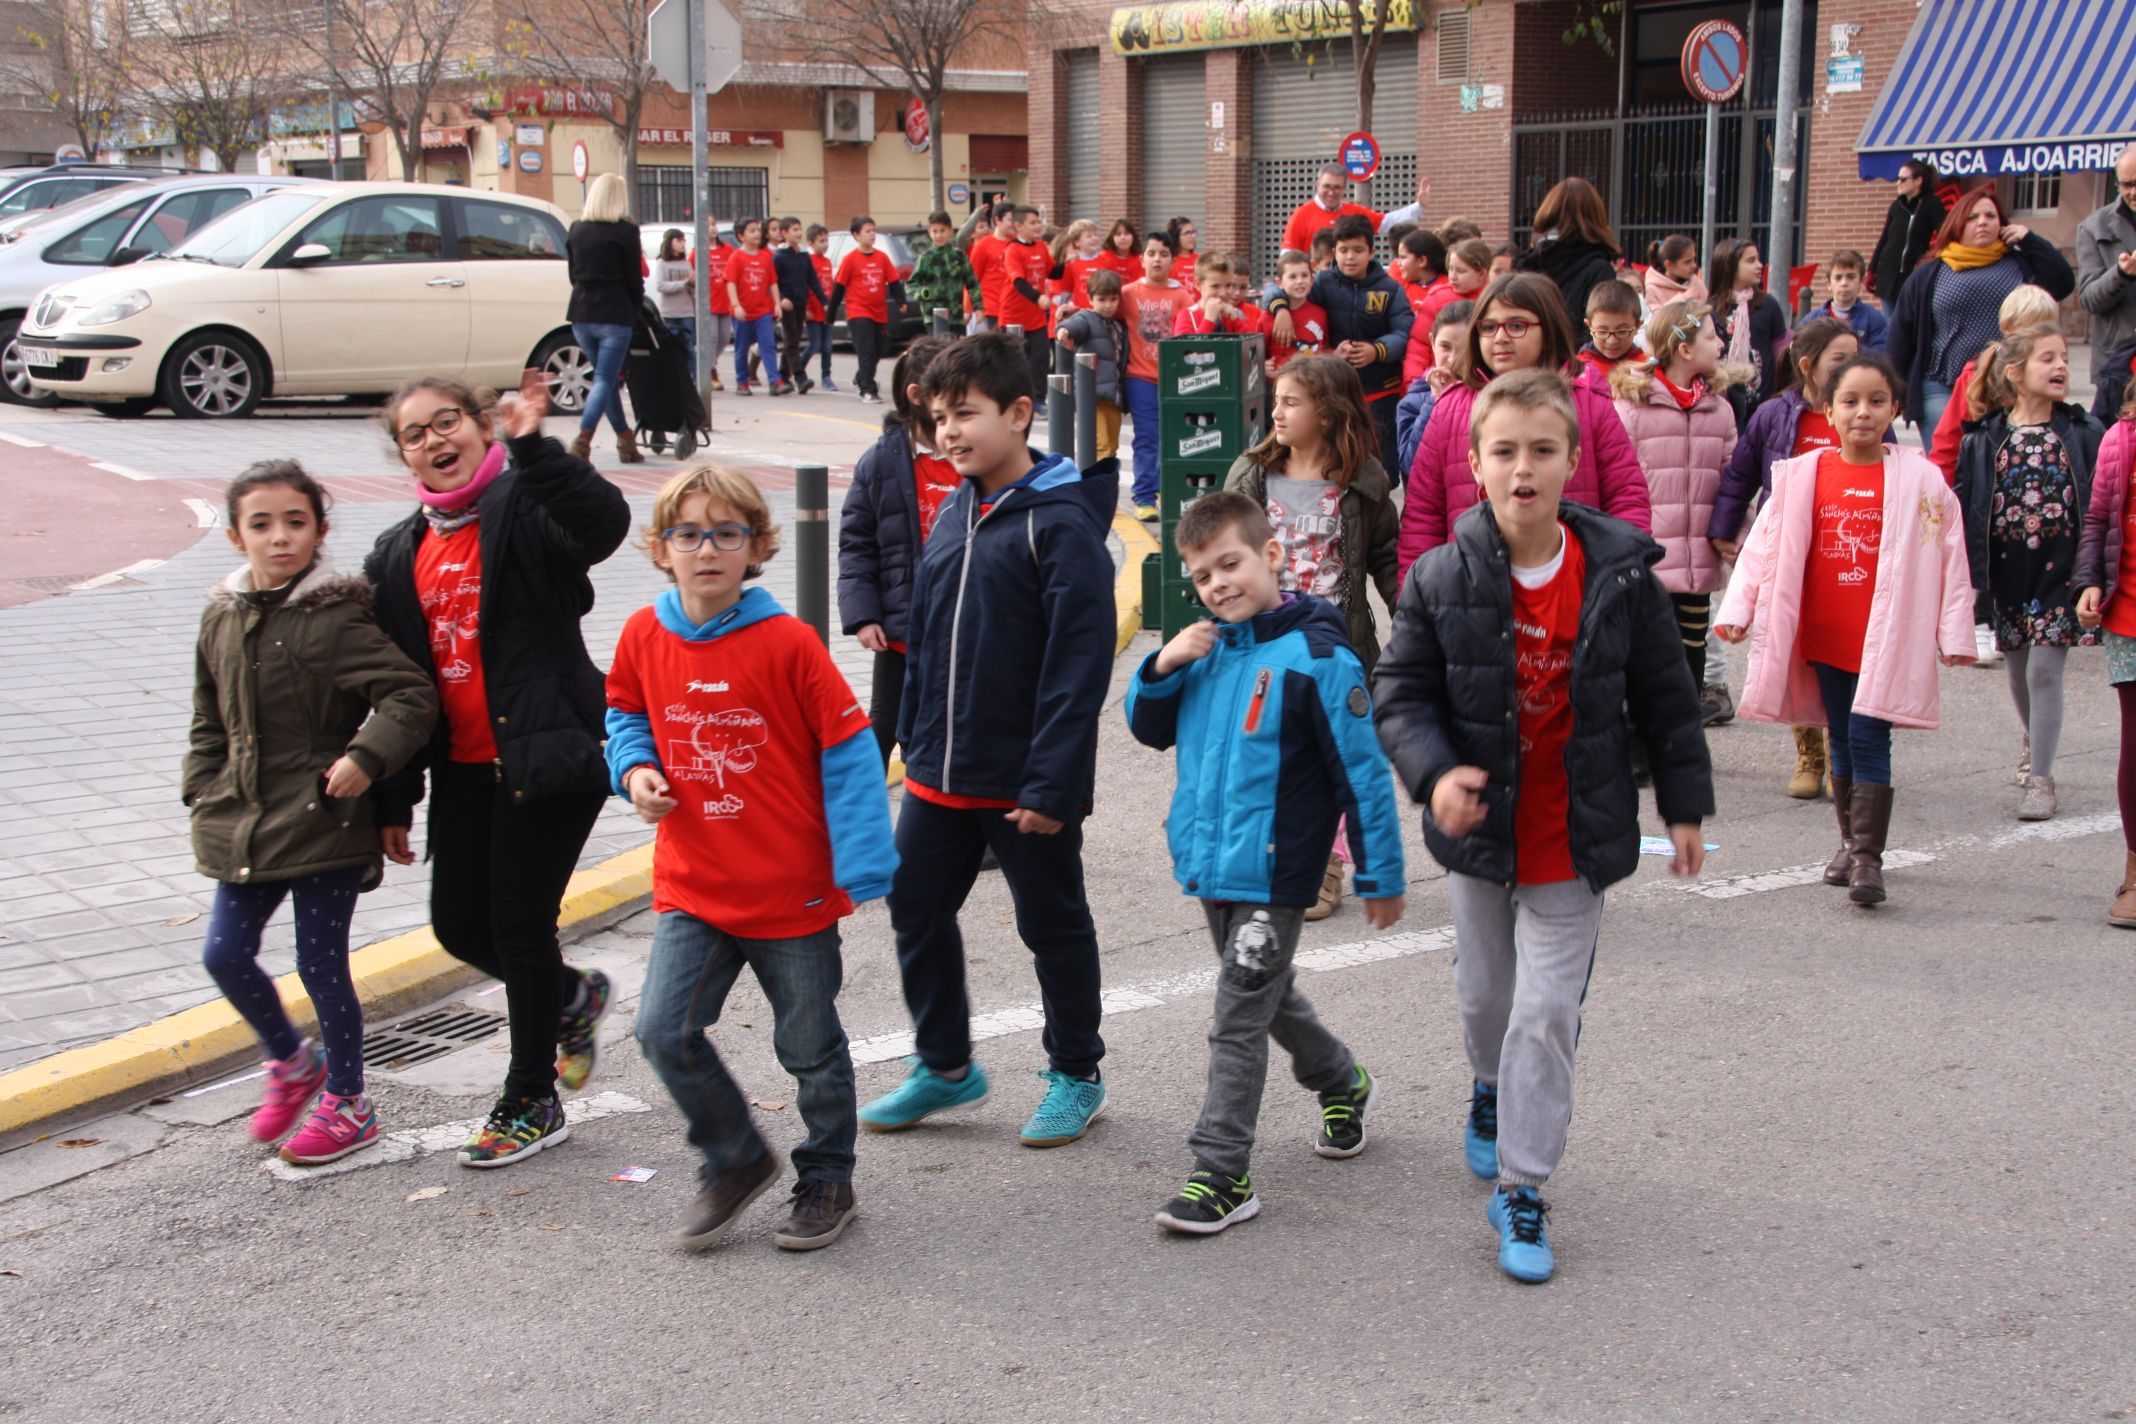 II Marxa Solidaria 2016 (11)